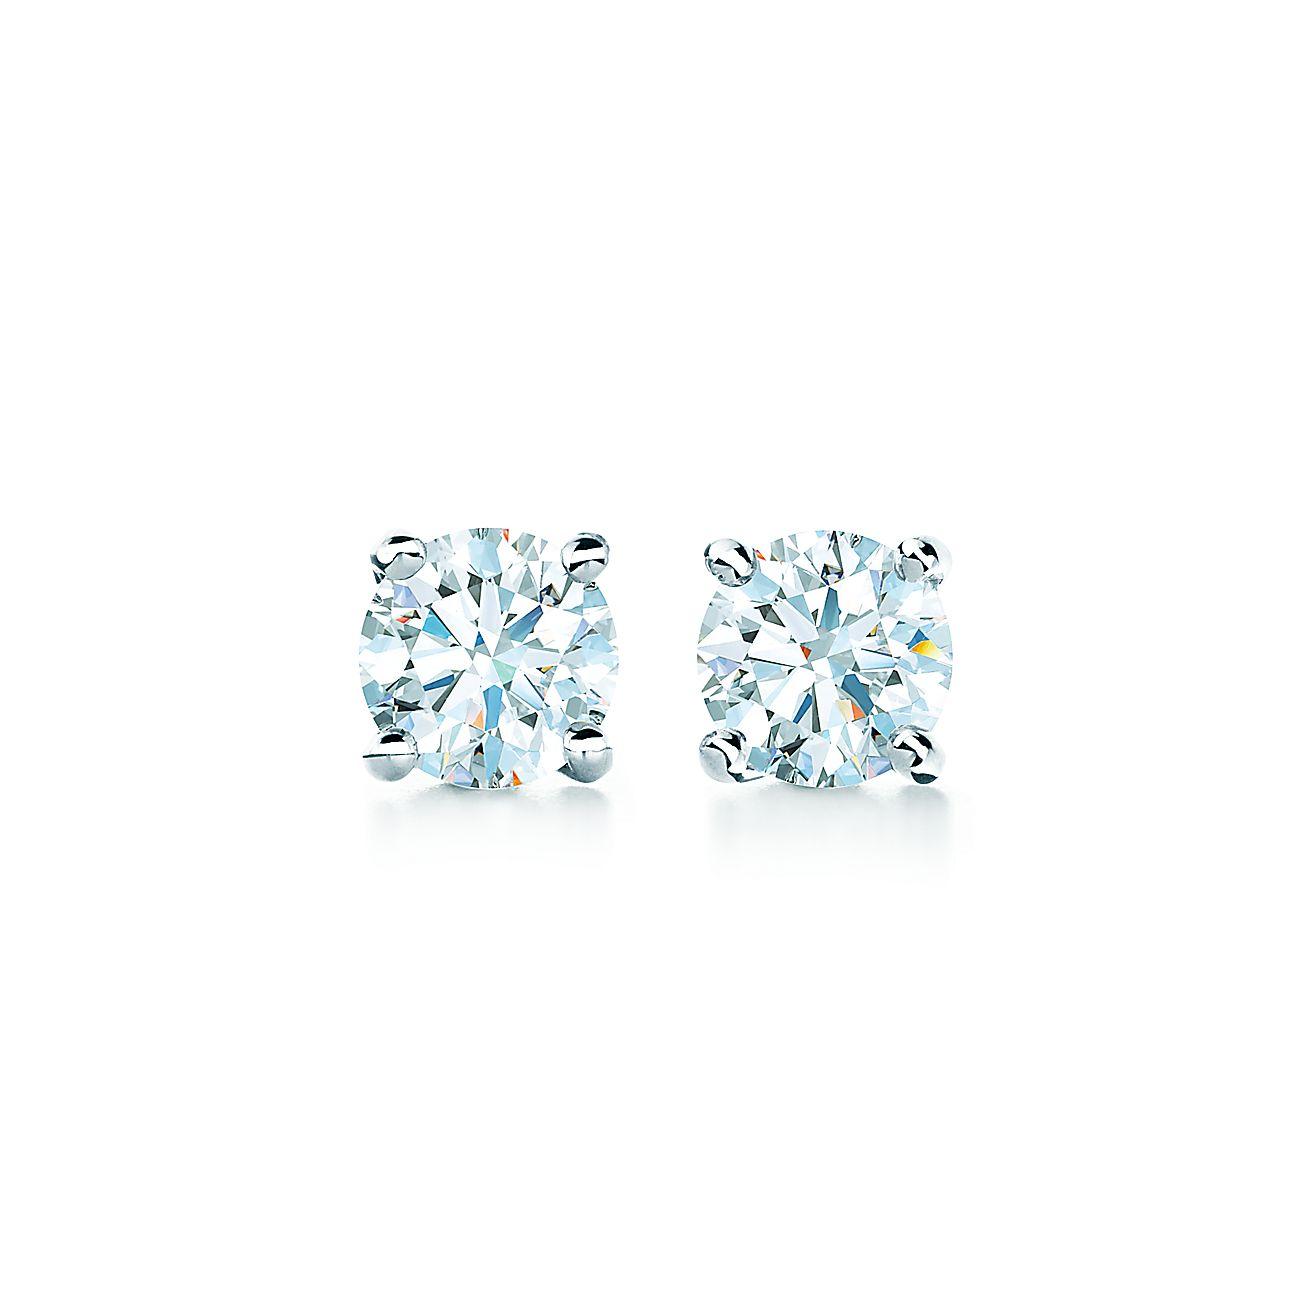 Tiffany Solitaire Diamond Earrings Price